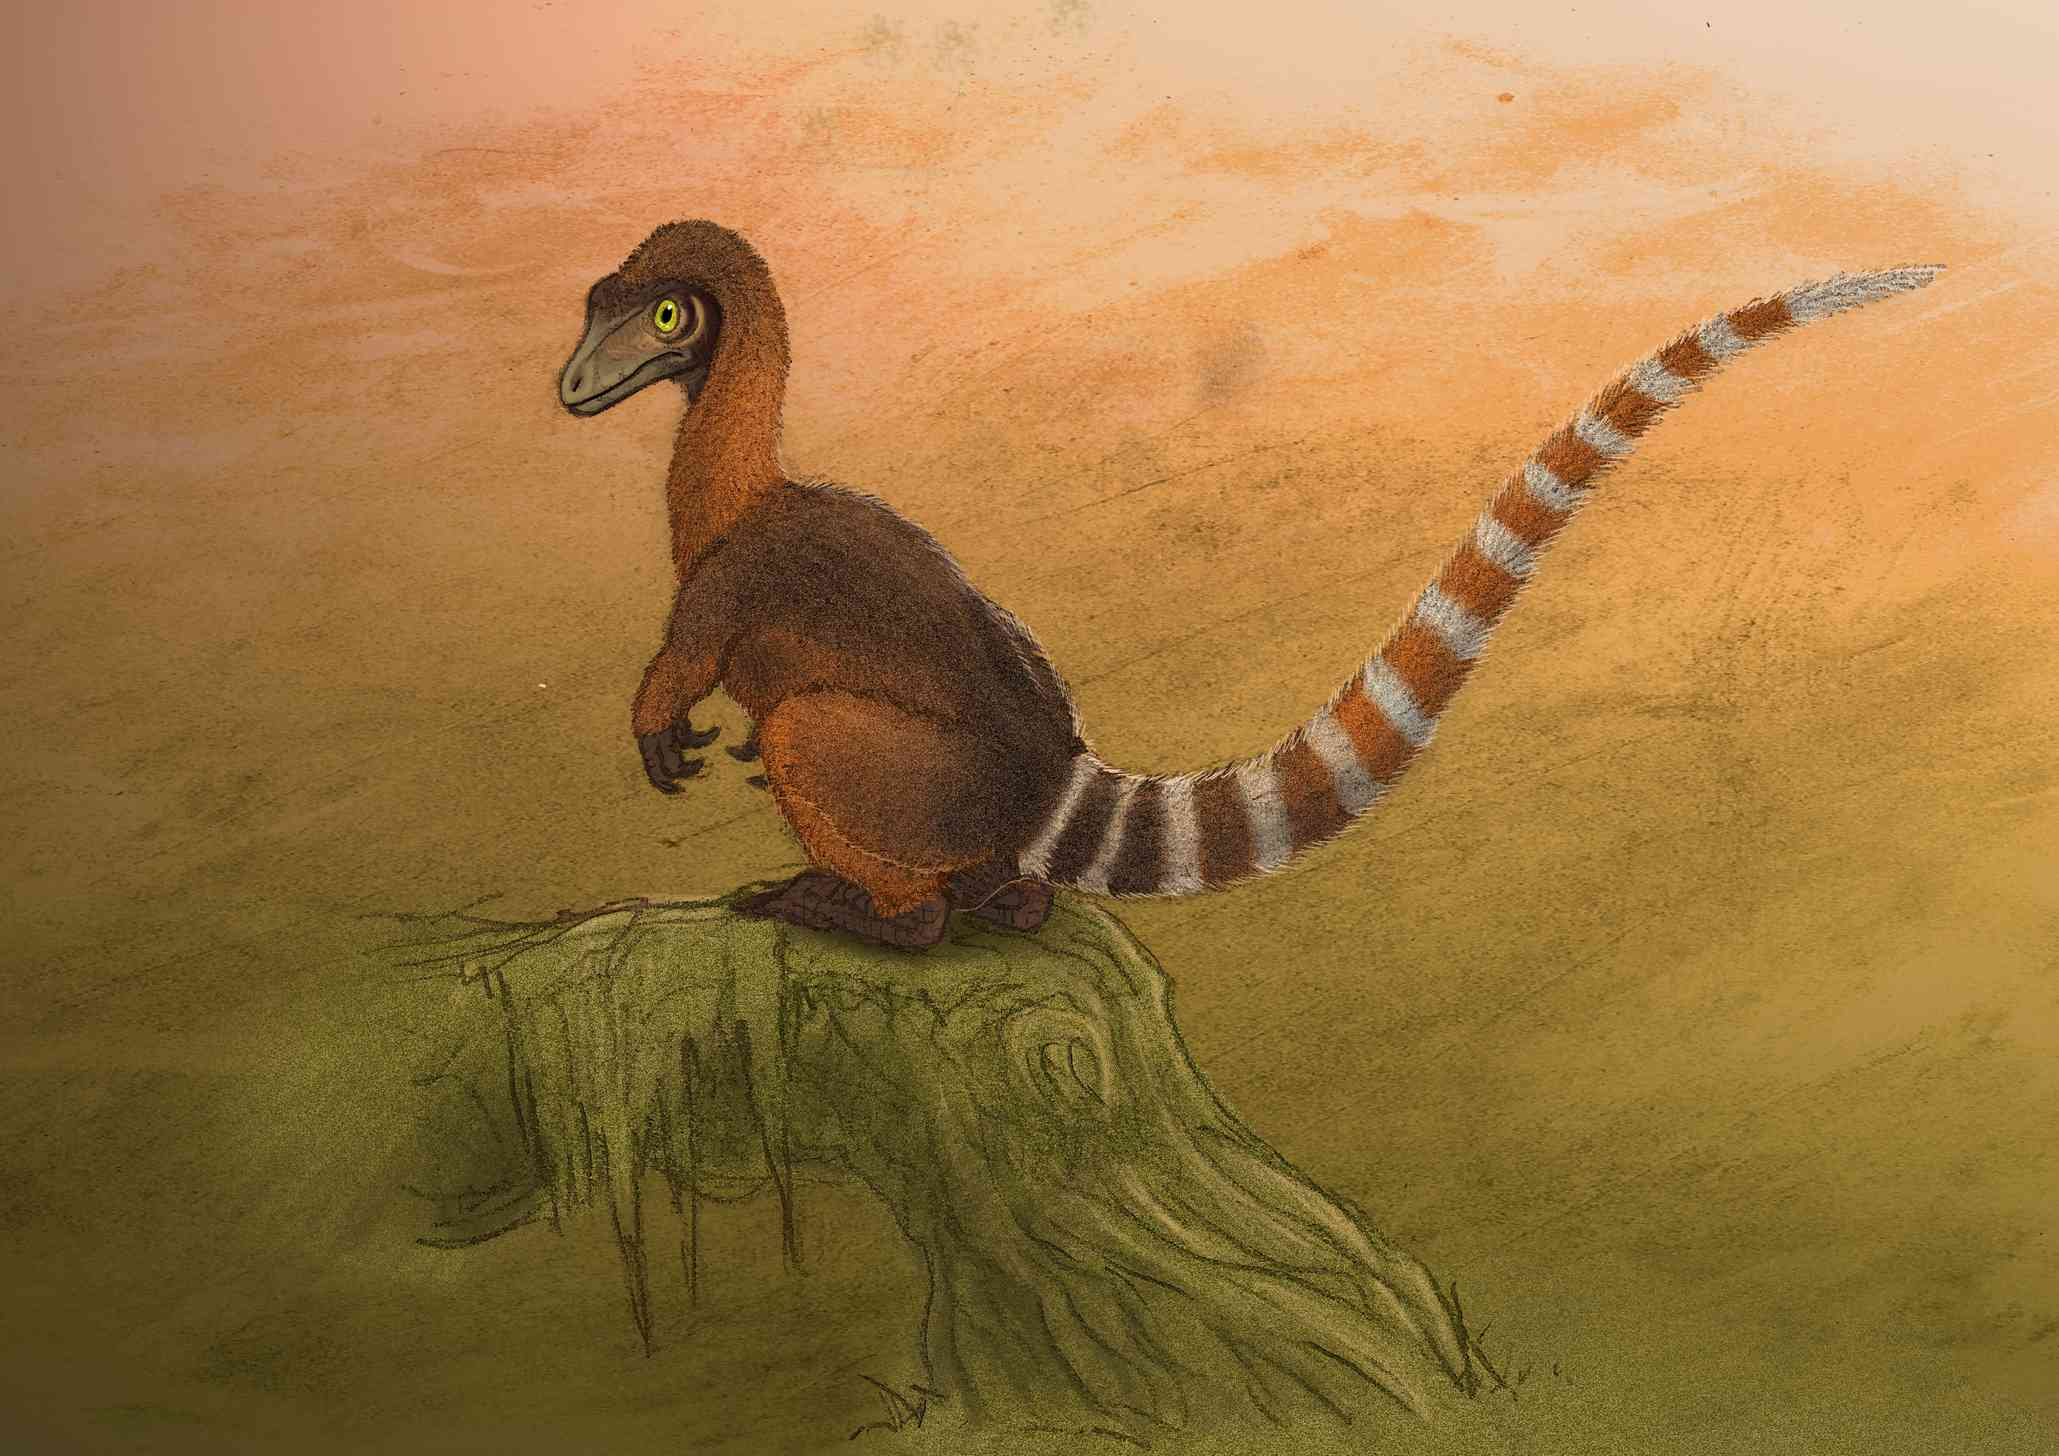 A Sinosauropteryx dinosaur resting on a log.